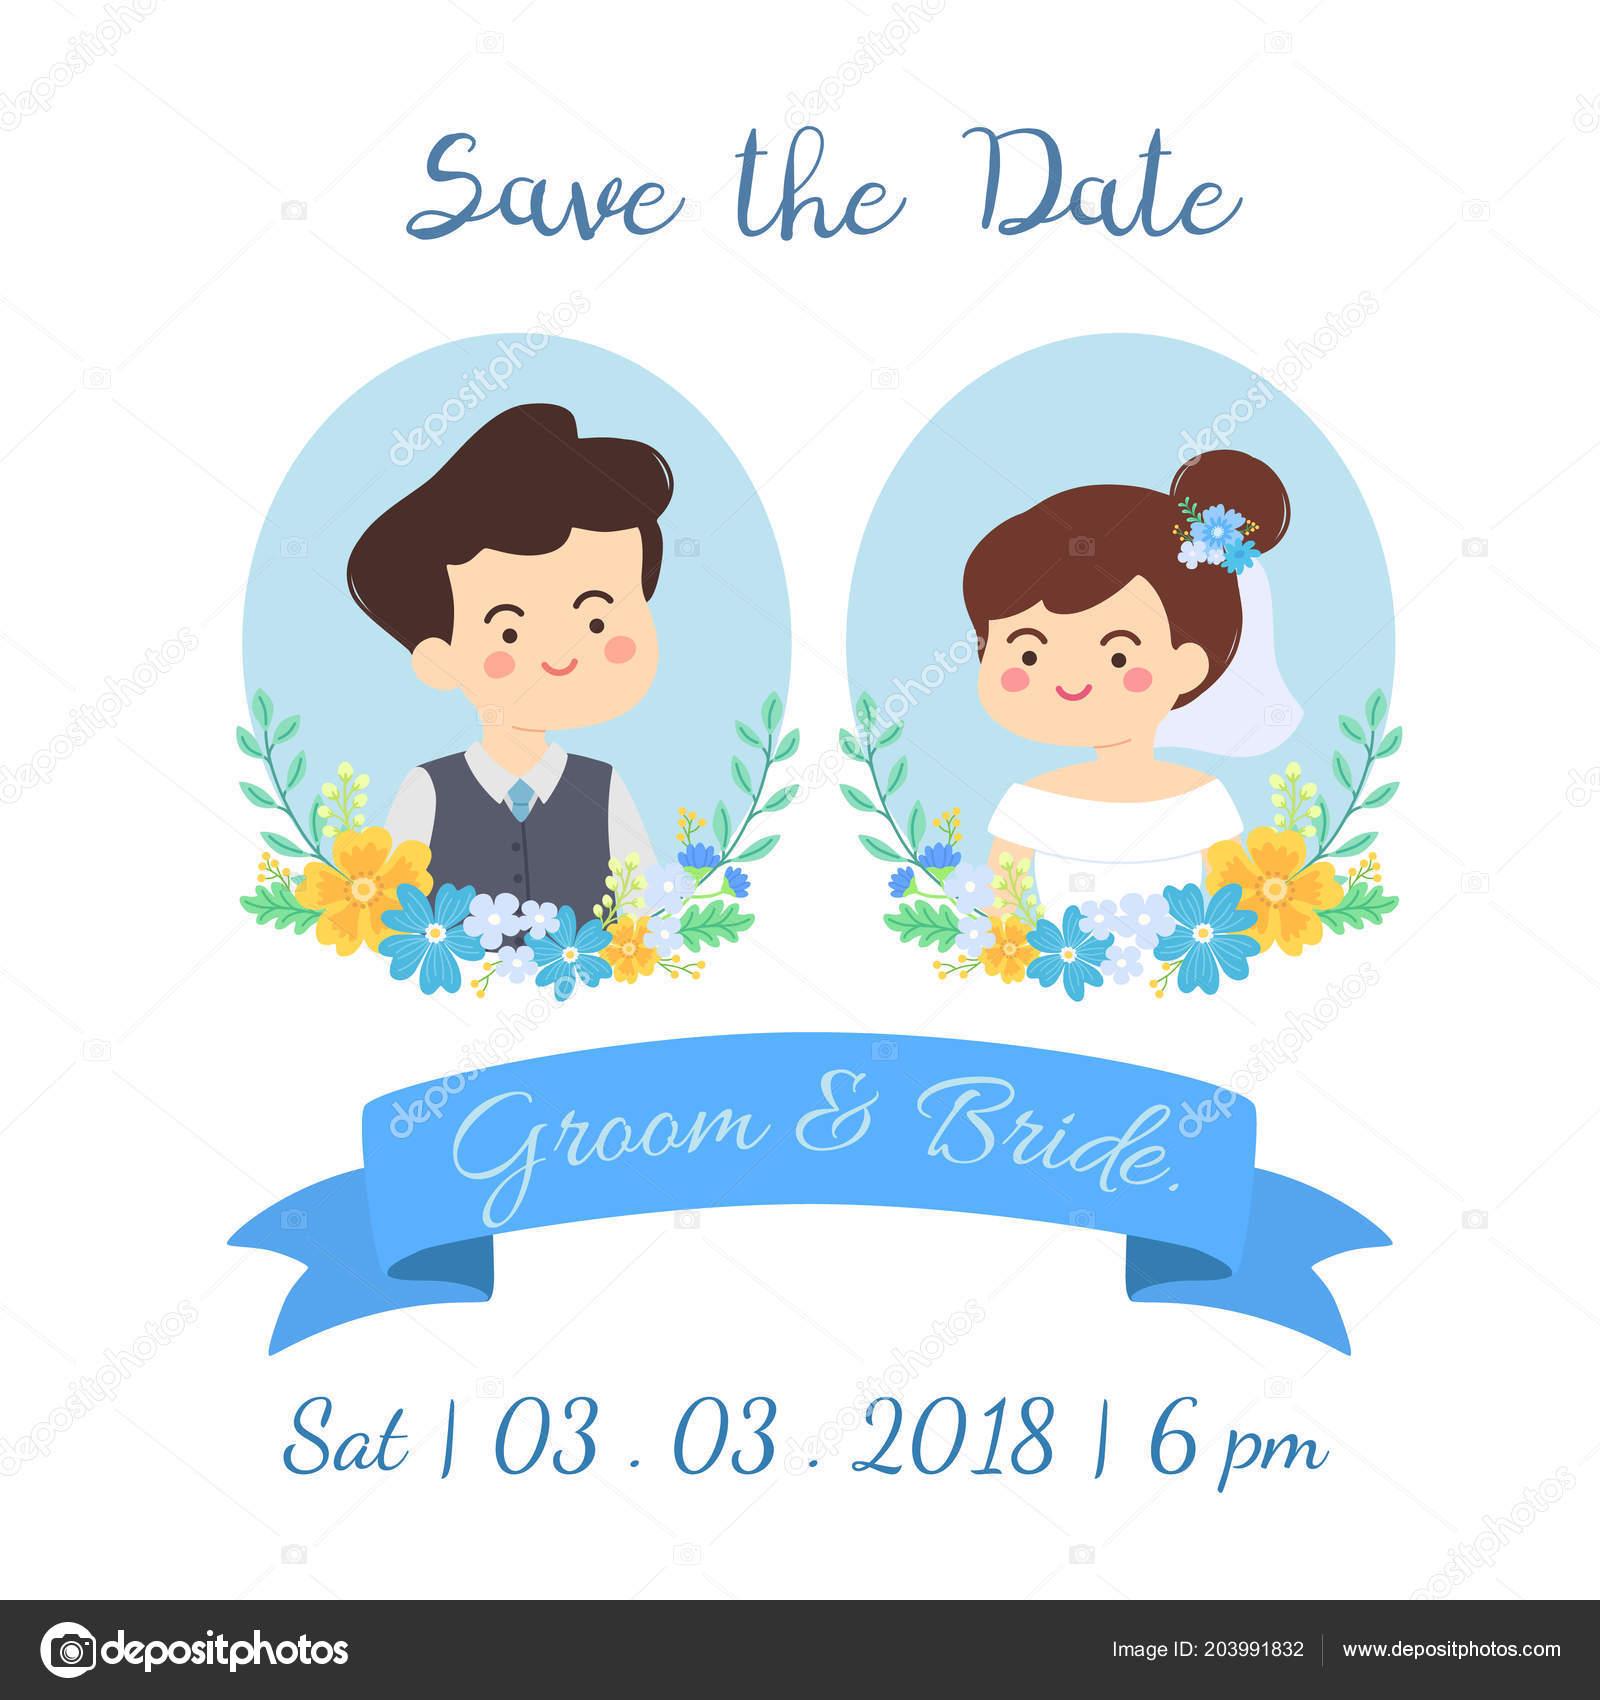 Cute Wedding Couple Date Invitation Card Vector Illustration Cartoon Bride Stock Vector C Anitnov 203991832